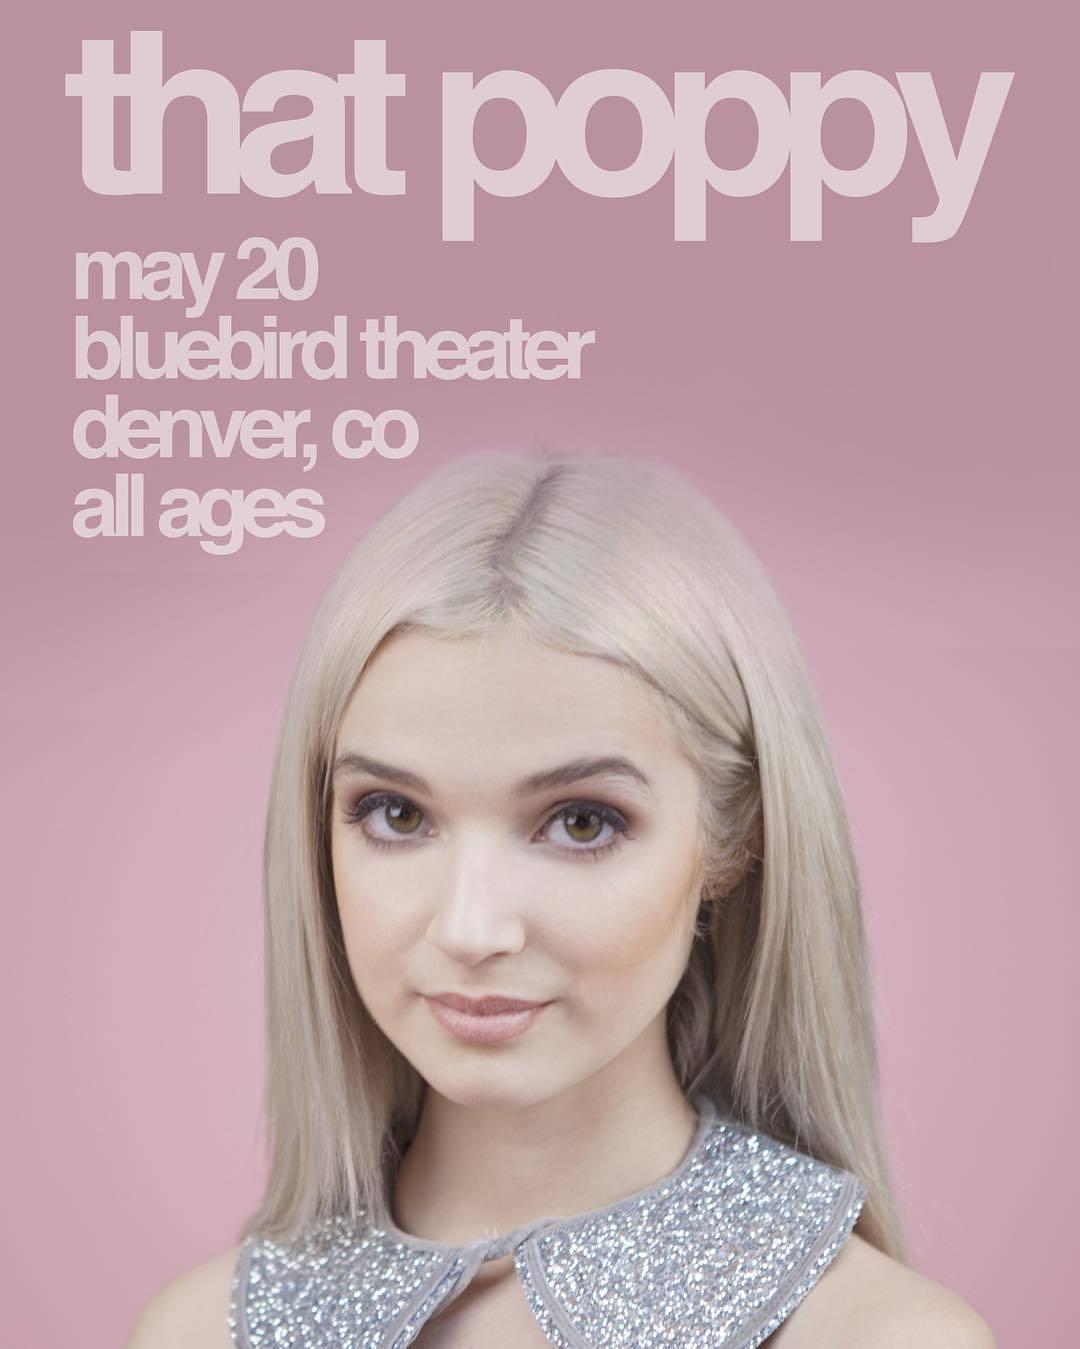 05/20/16 at Bluebird Theater